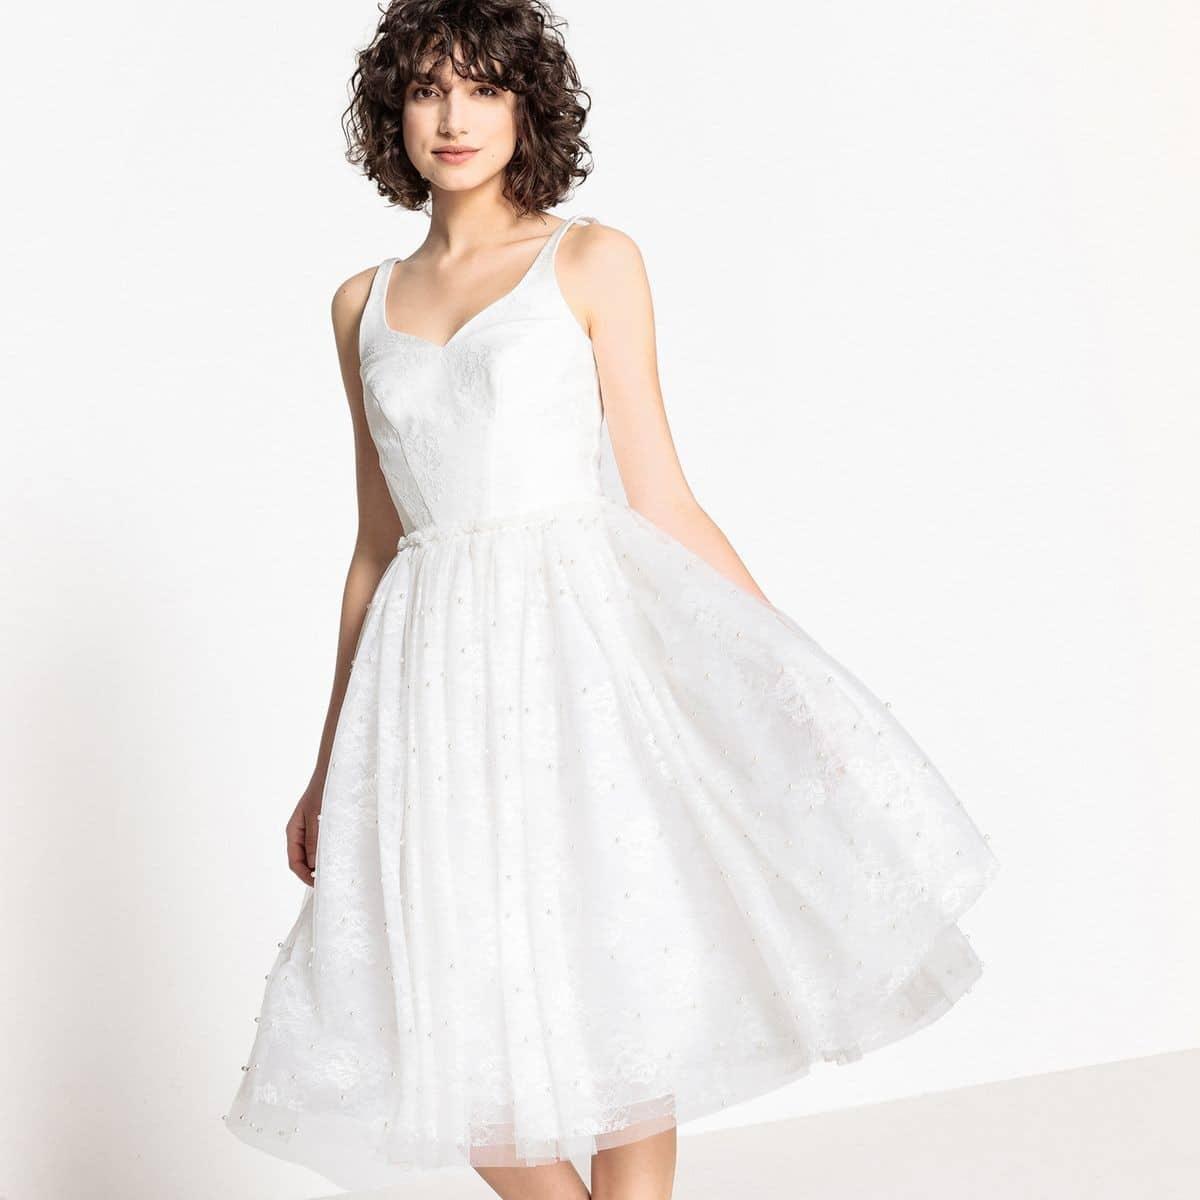 Robe De Mariee Mademoiselle R Robe De Mariee Evasee Dentelle Et Perles The Wedding Explorer